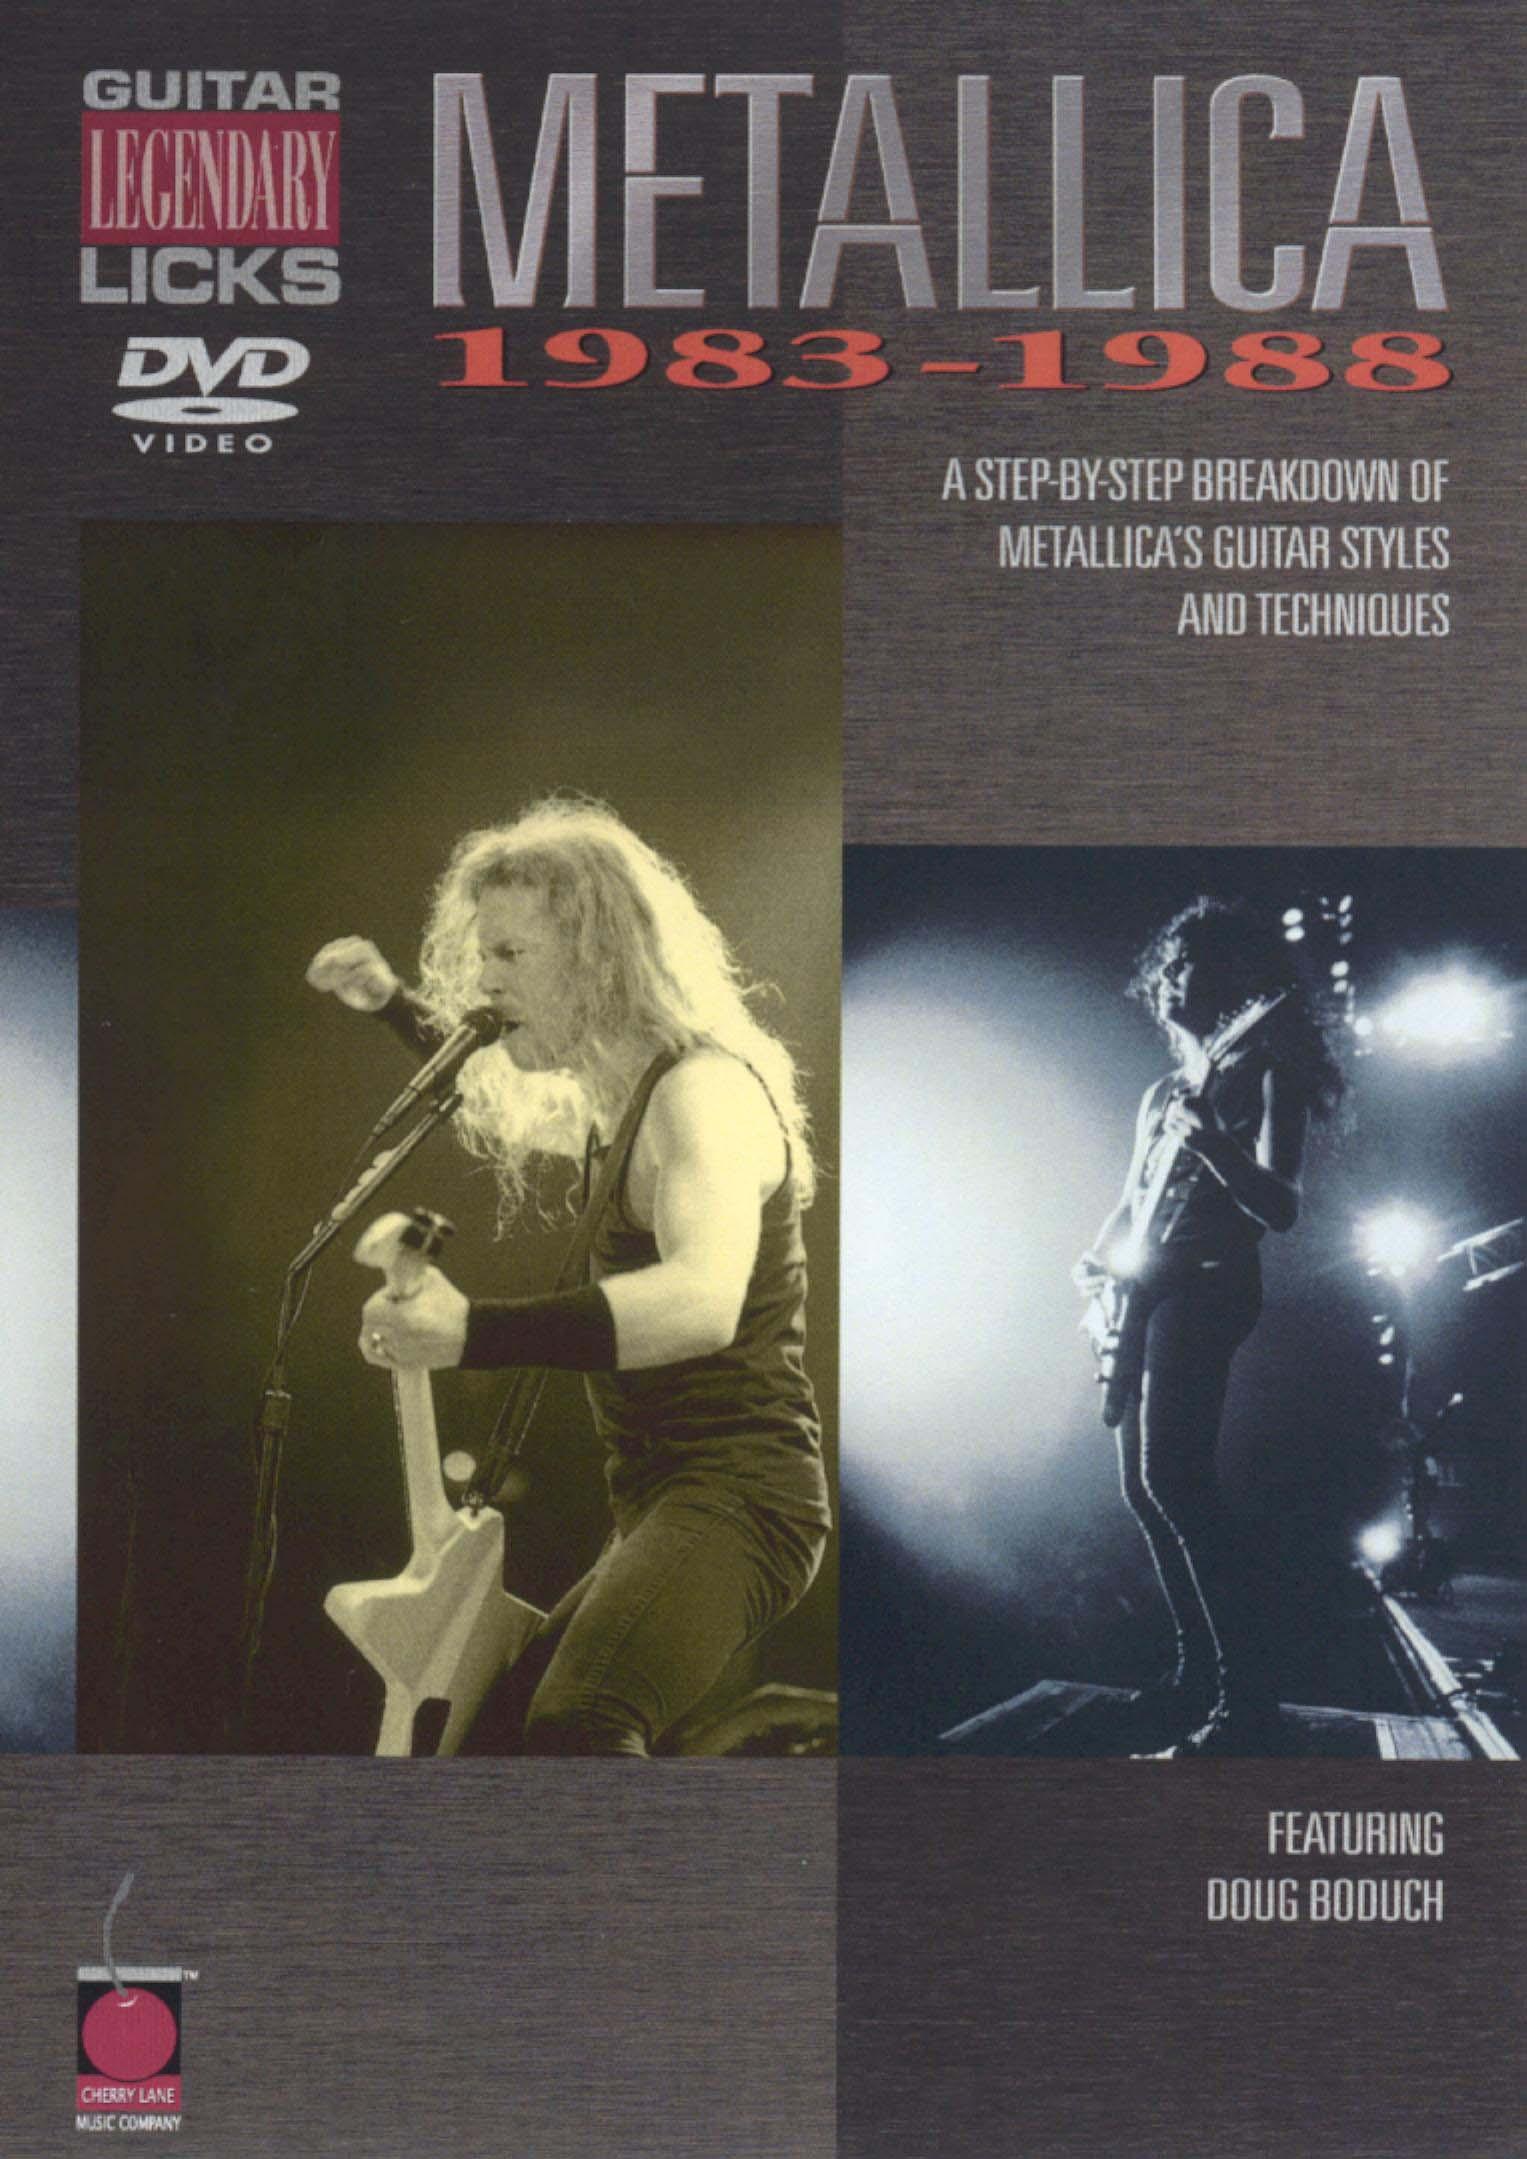 Metallica: Legendary Licks - Guitar, 1983-1988